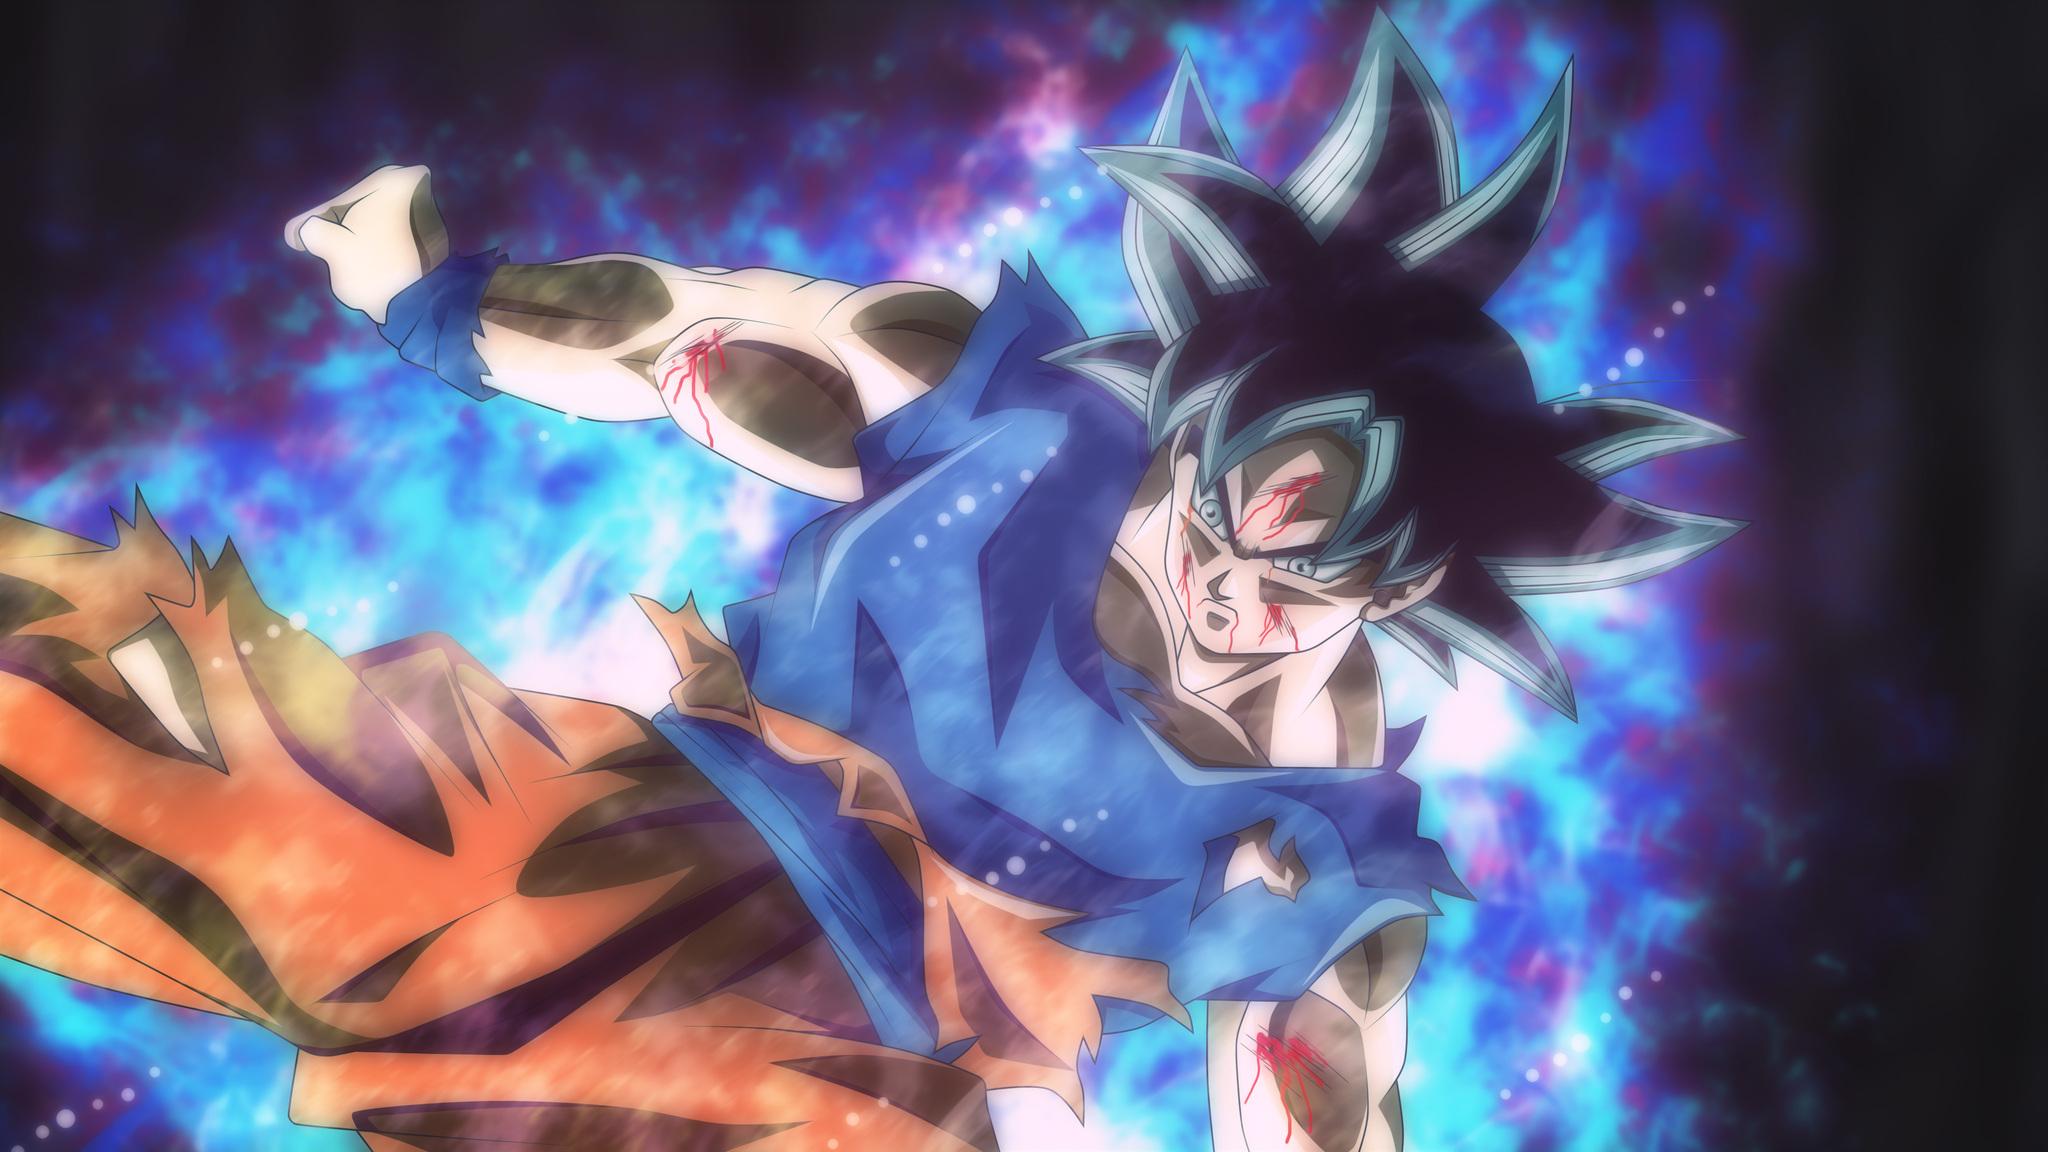 2048x1152 Anime Dragon Ball Super 2048x1152 Resolution HD